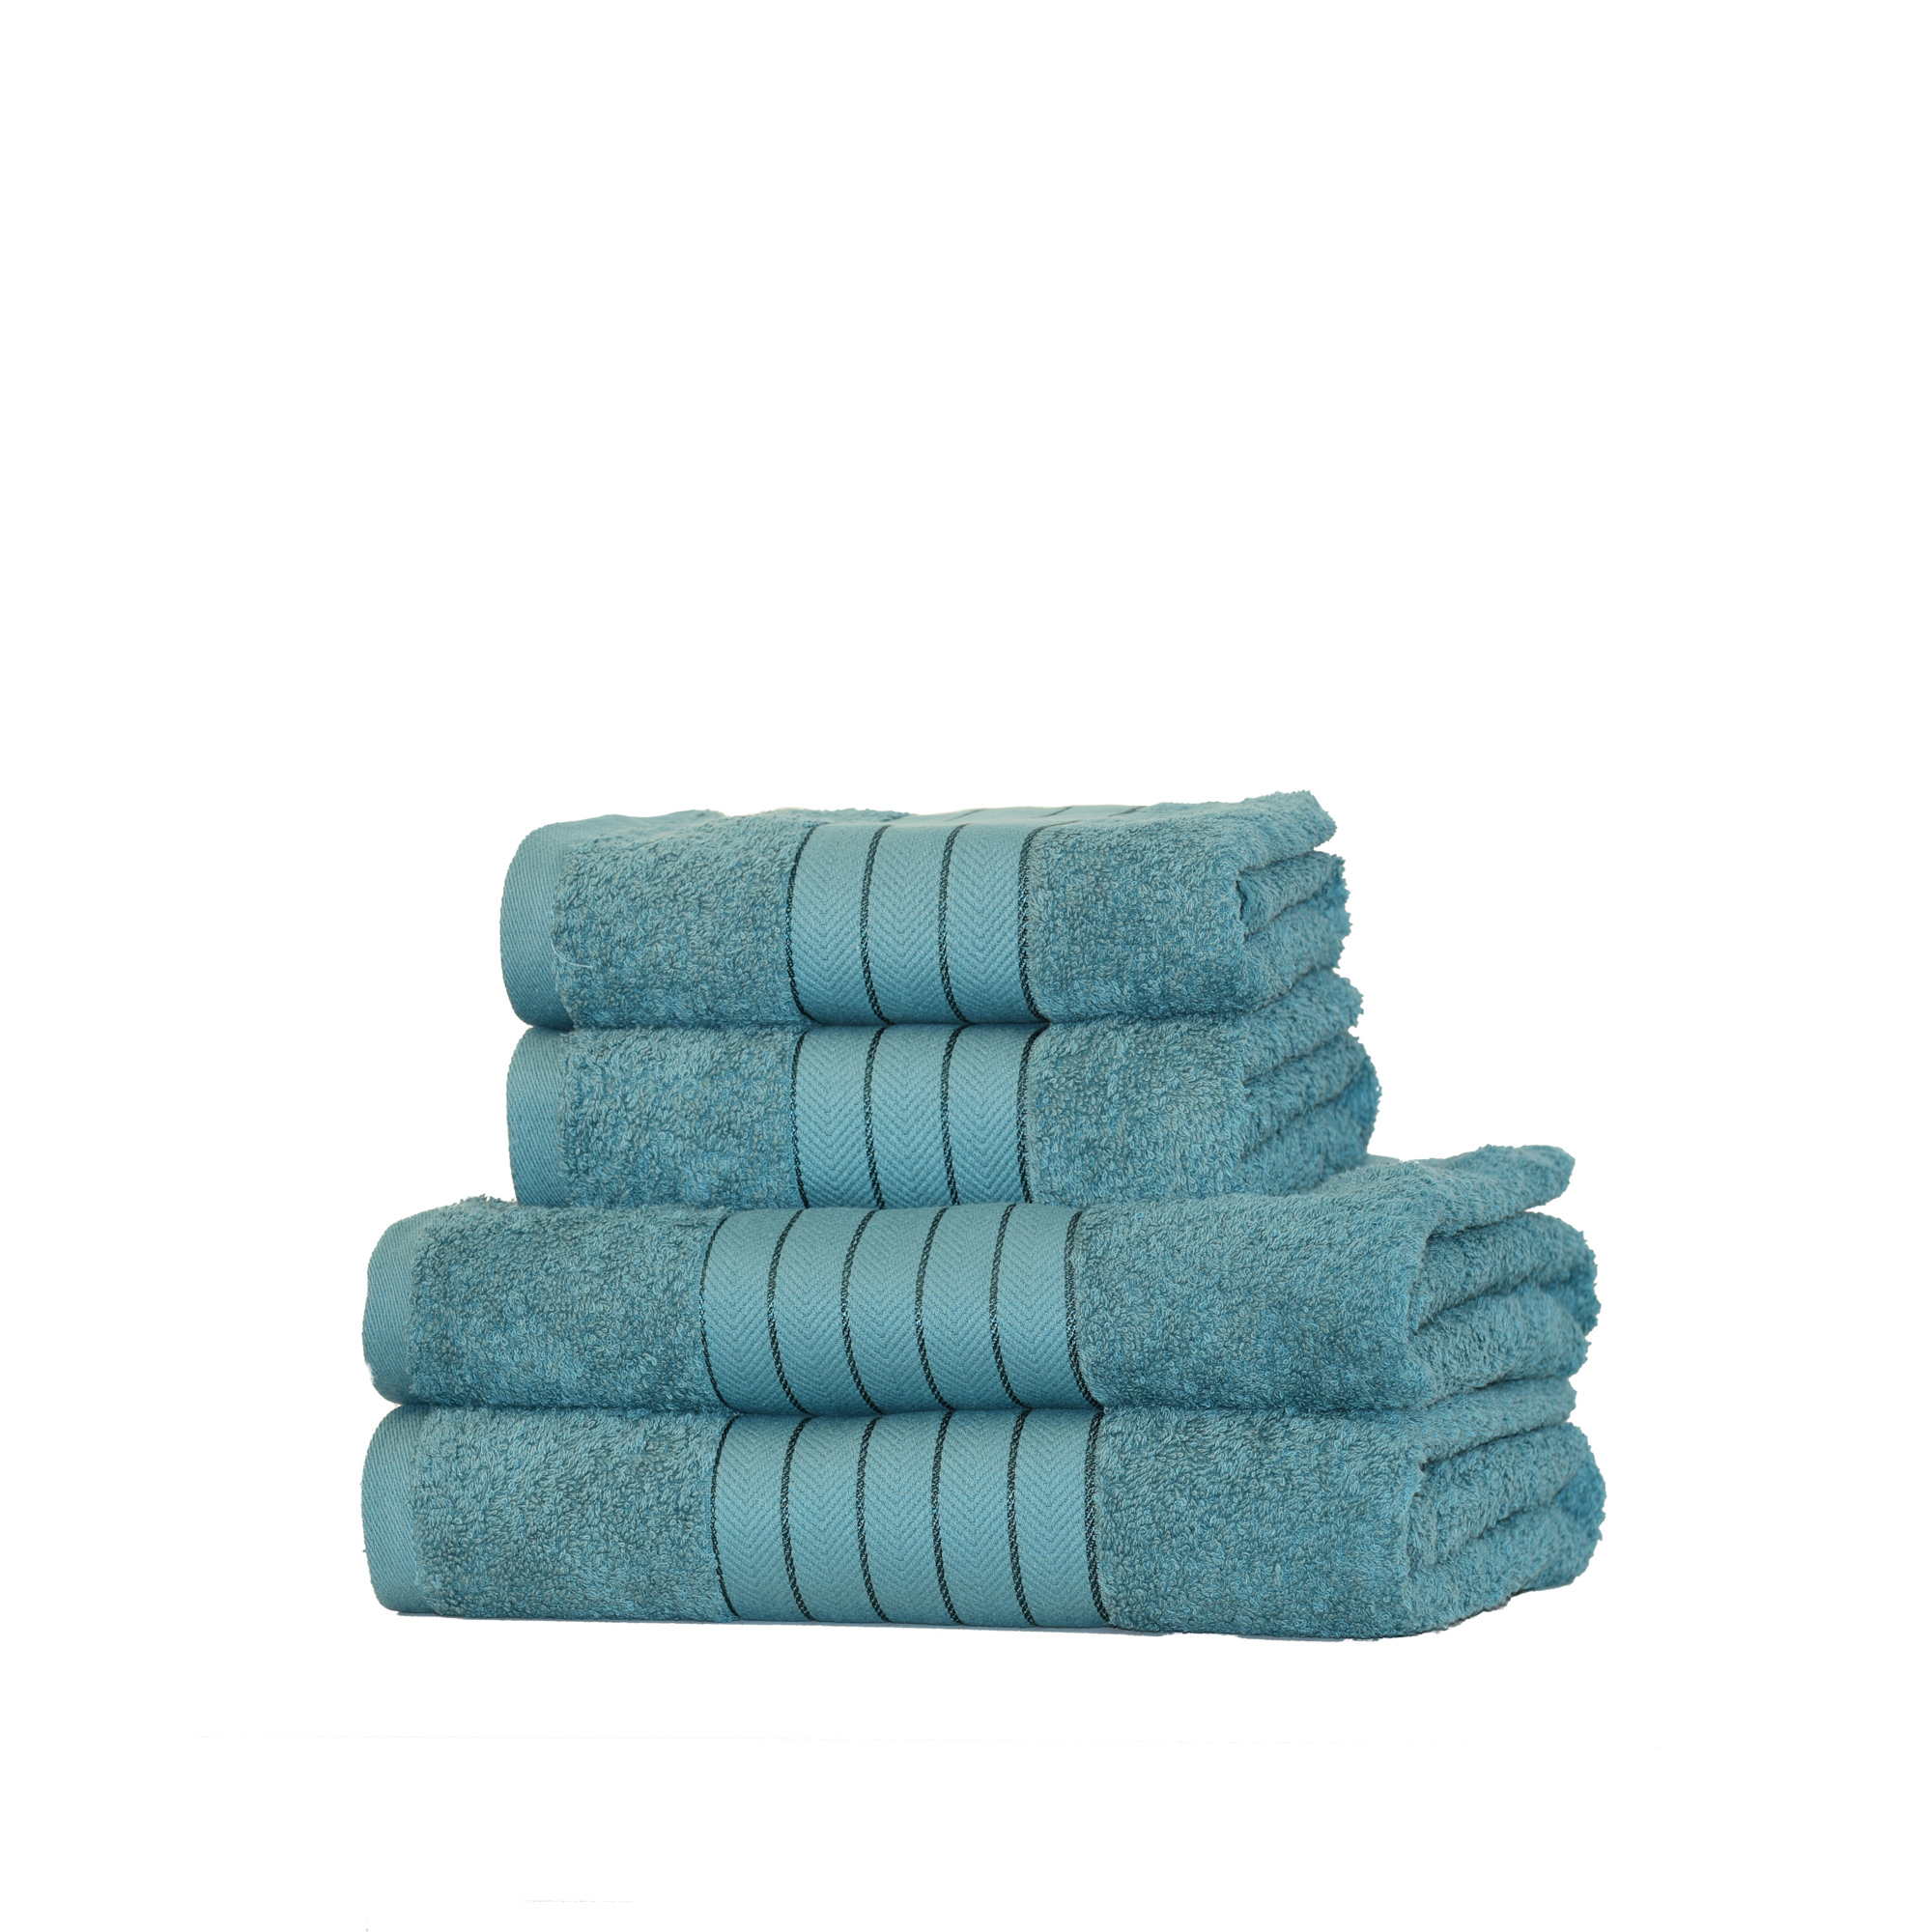 Bathroom Towels Luxury: Luxury 100% Egyptian Cotton 4 Piece Bathroom Towel Bale